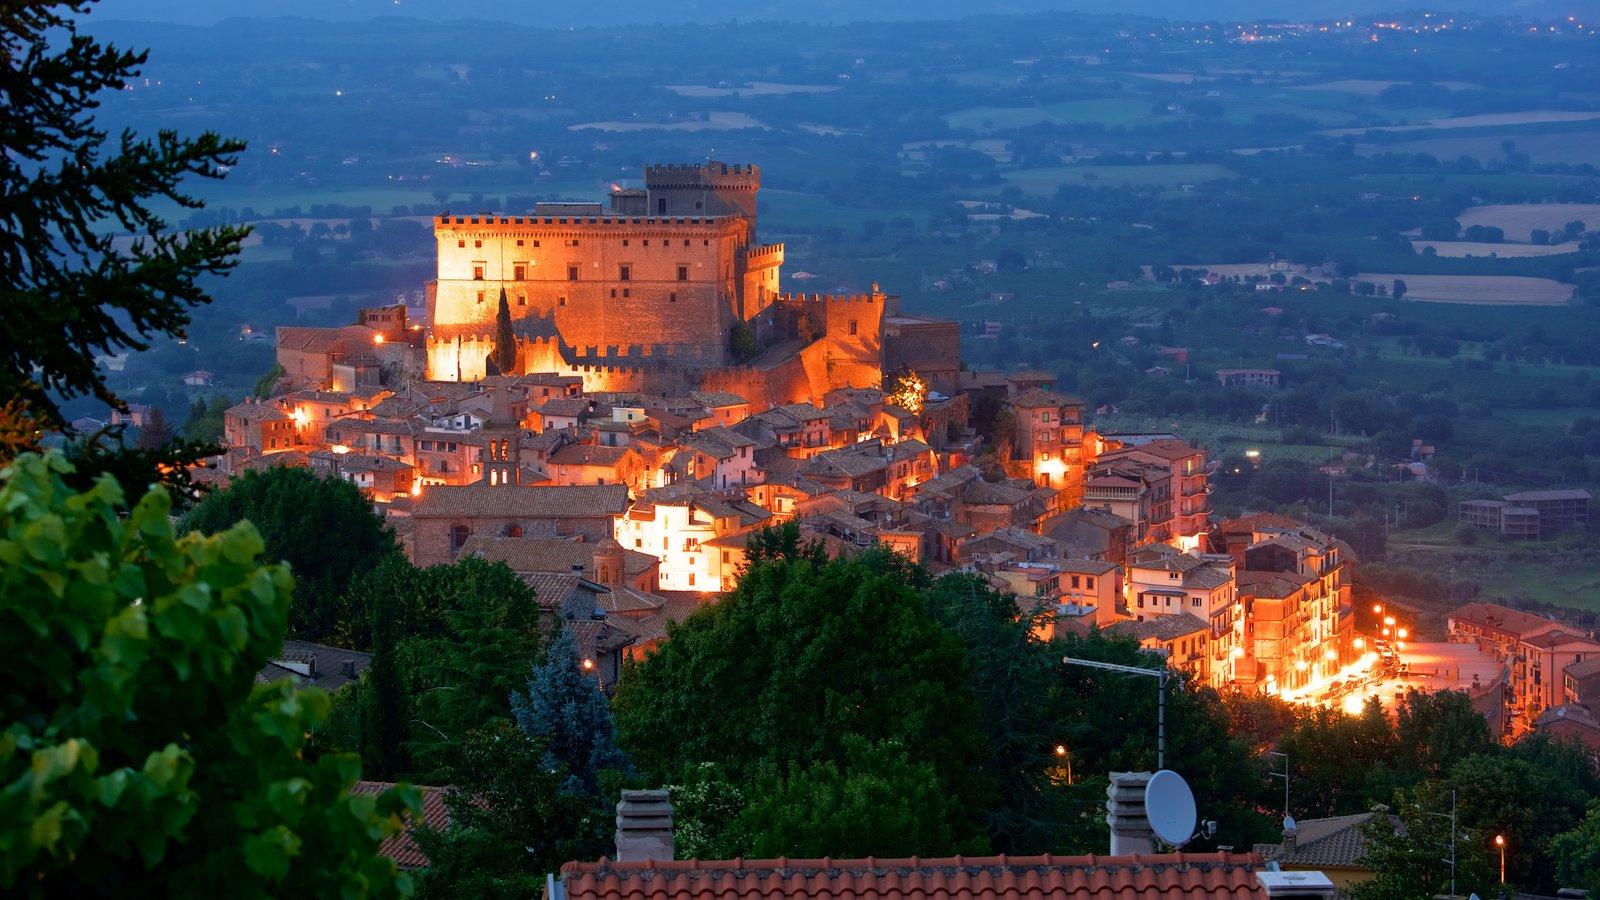 Soriano nel Cimino featuring night scenes, a city and heritage architecture